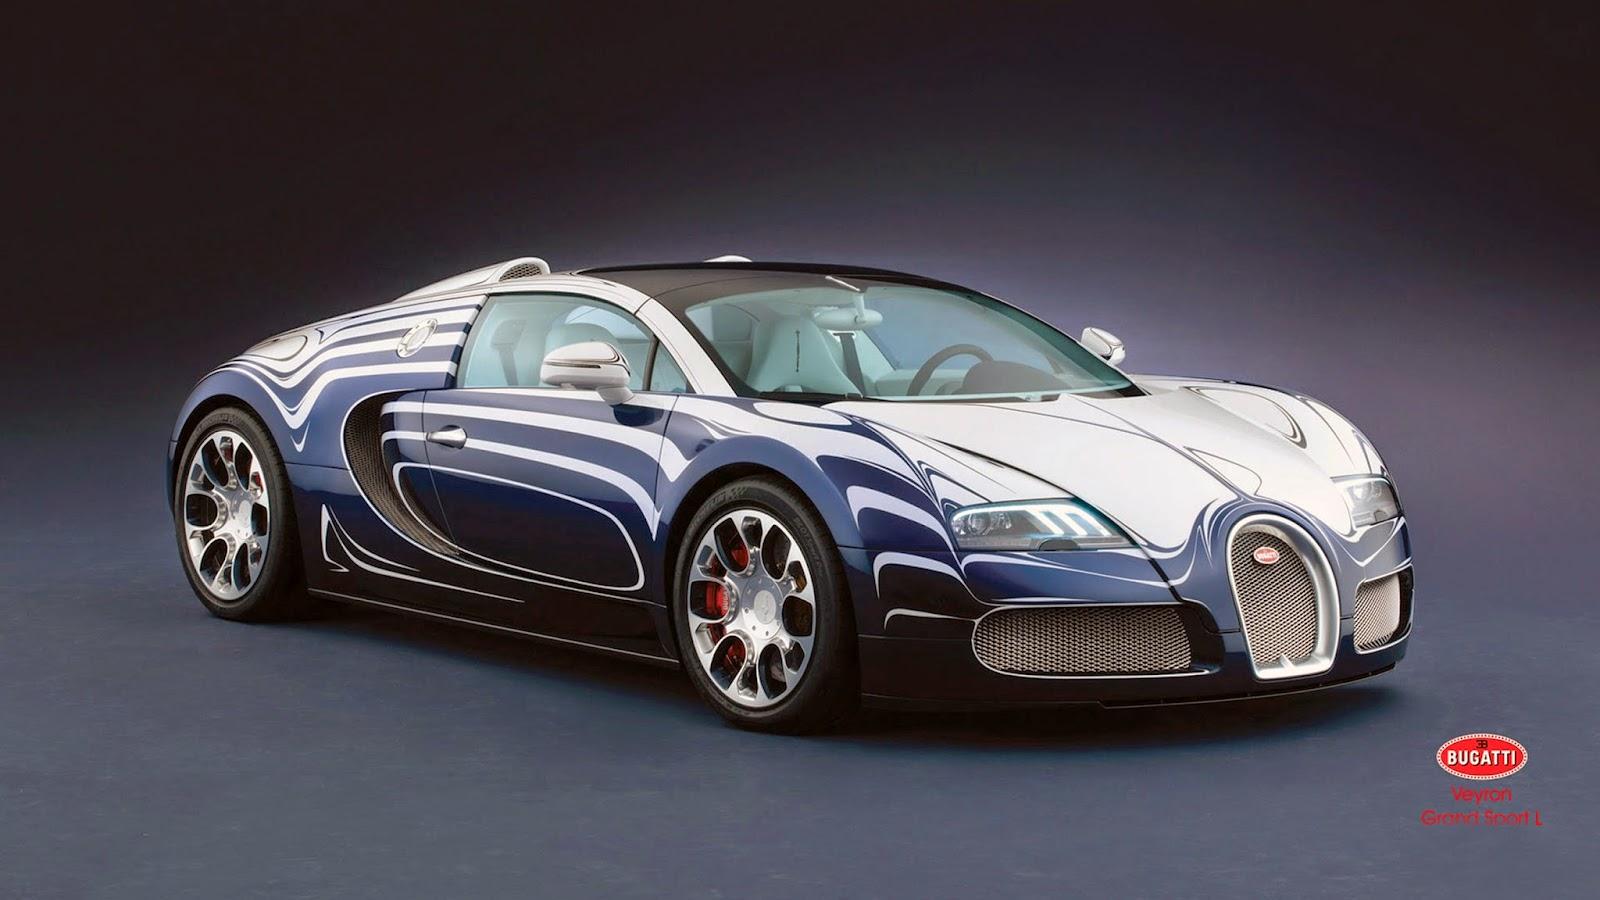 78 Fastest Car In The World Wallpaper On Wallpapersafari